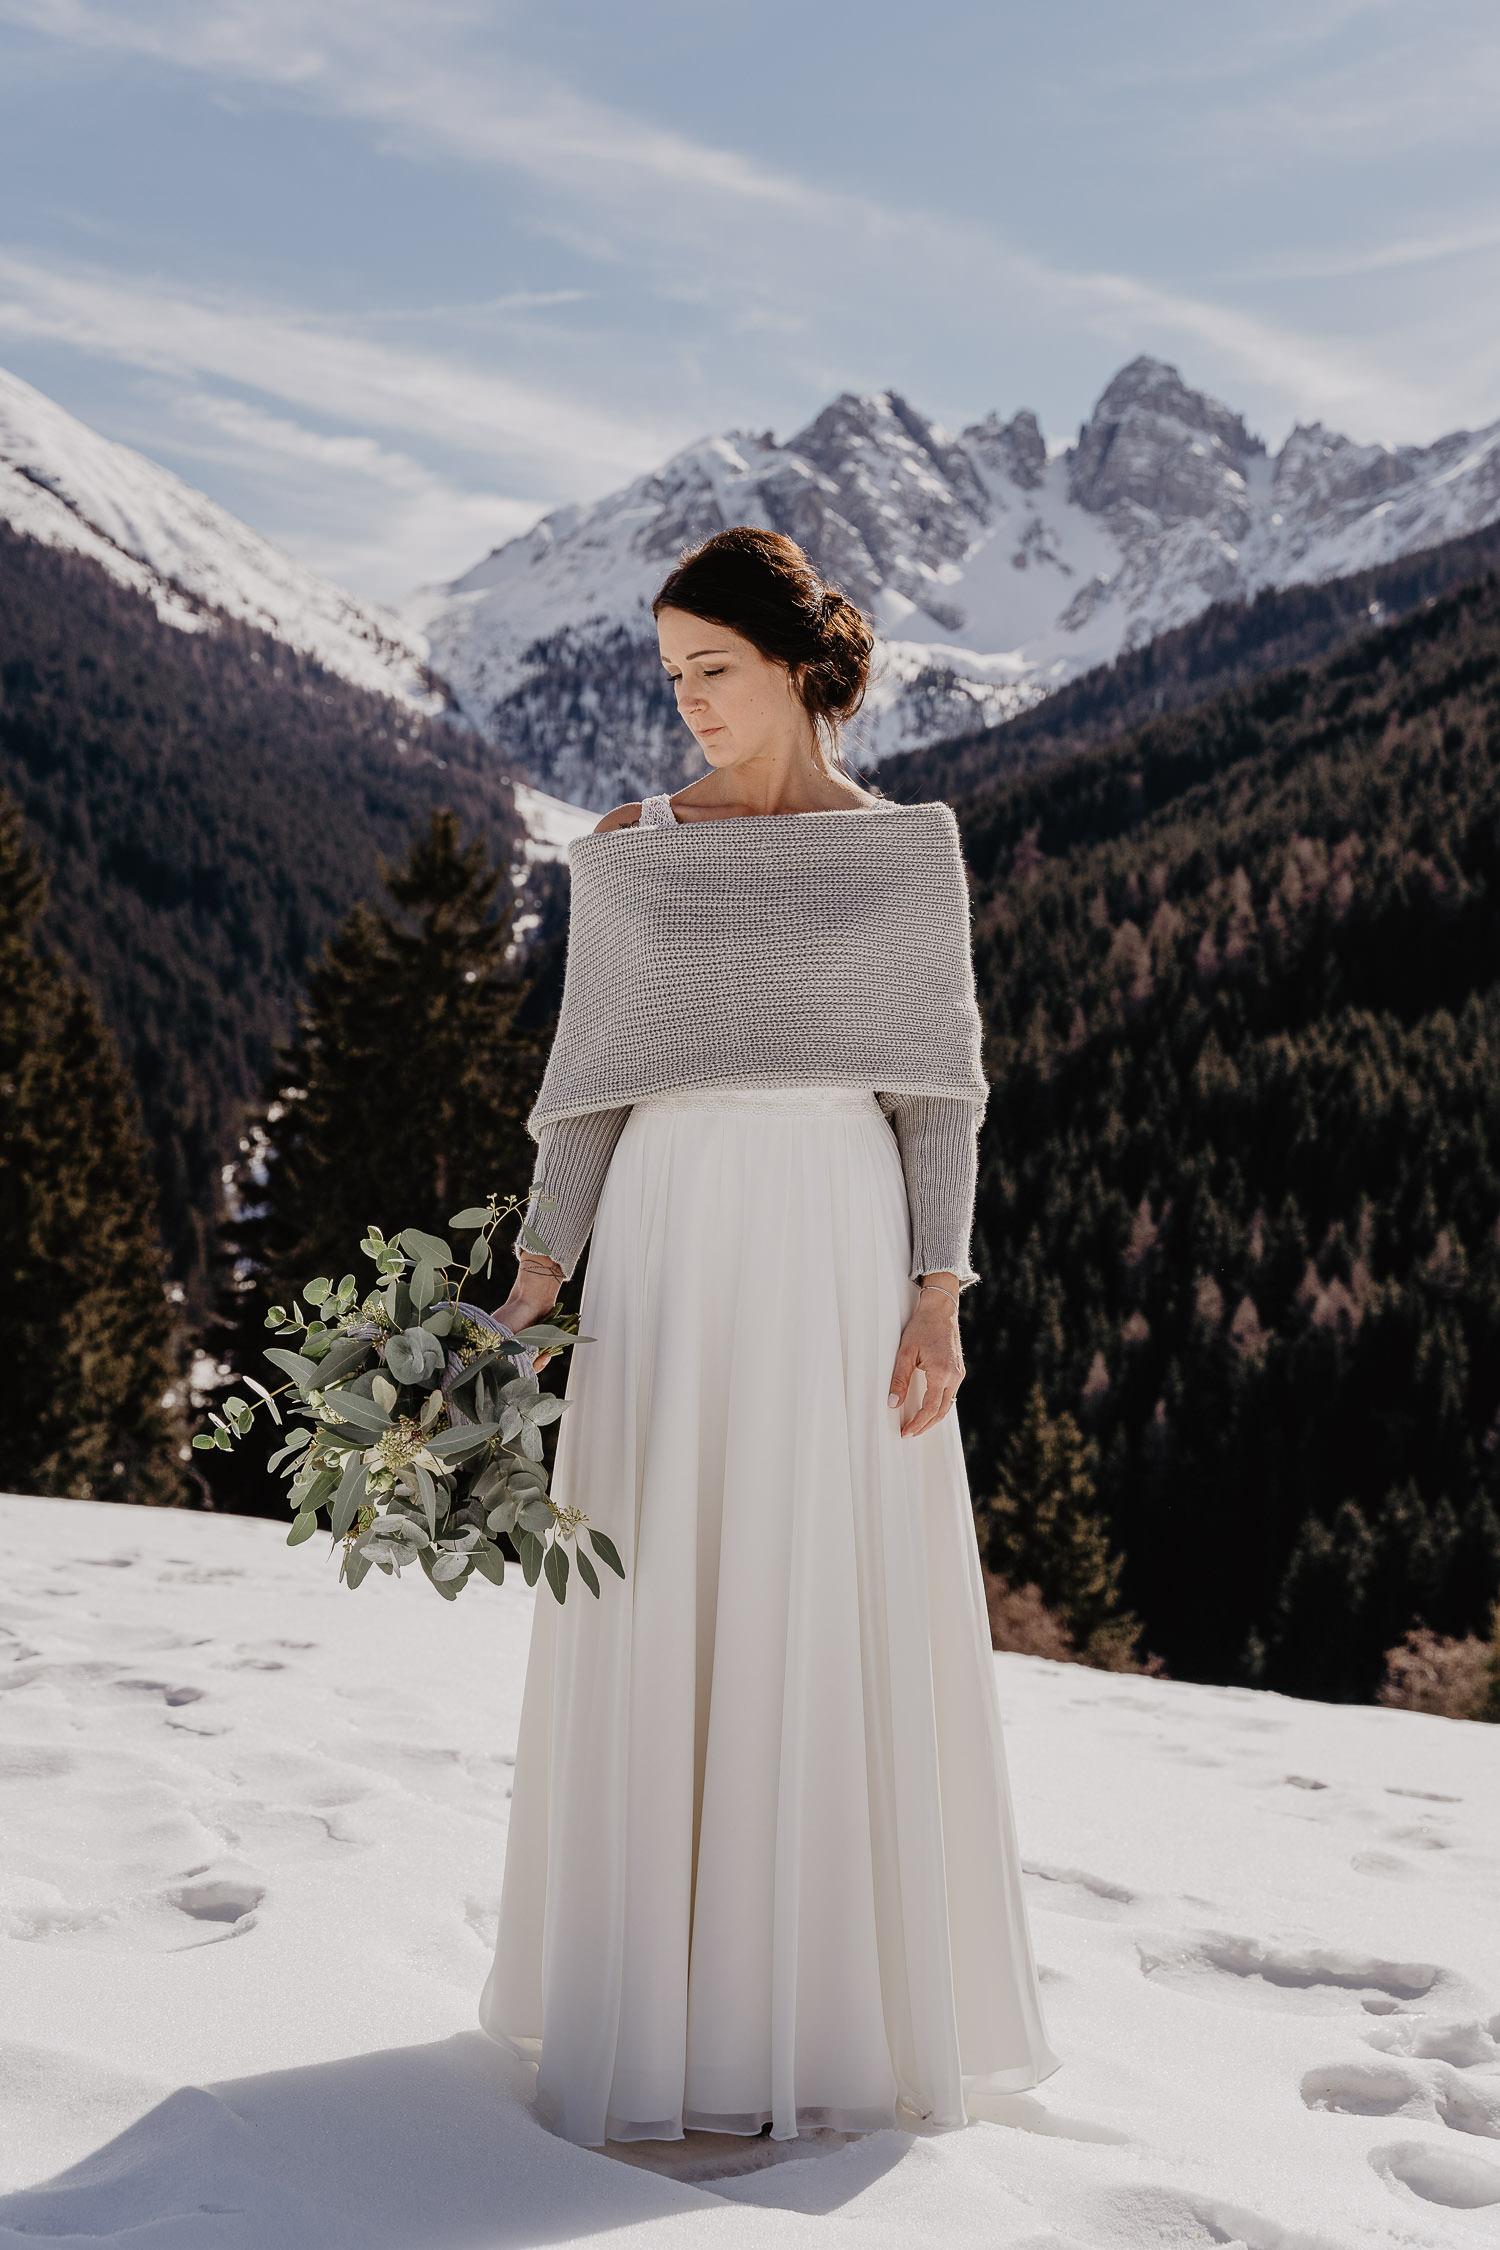 Hochzeitsfotograf Axams Patscherkofel 8